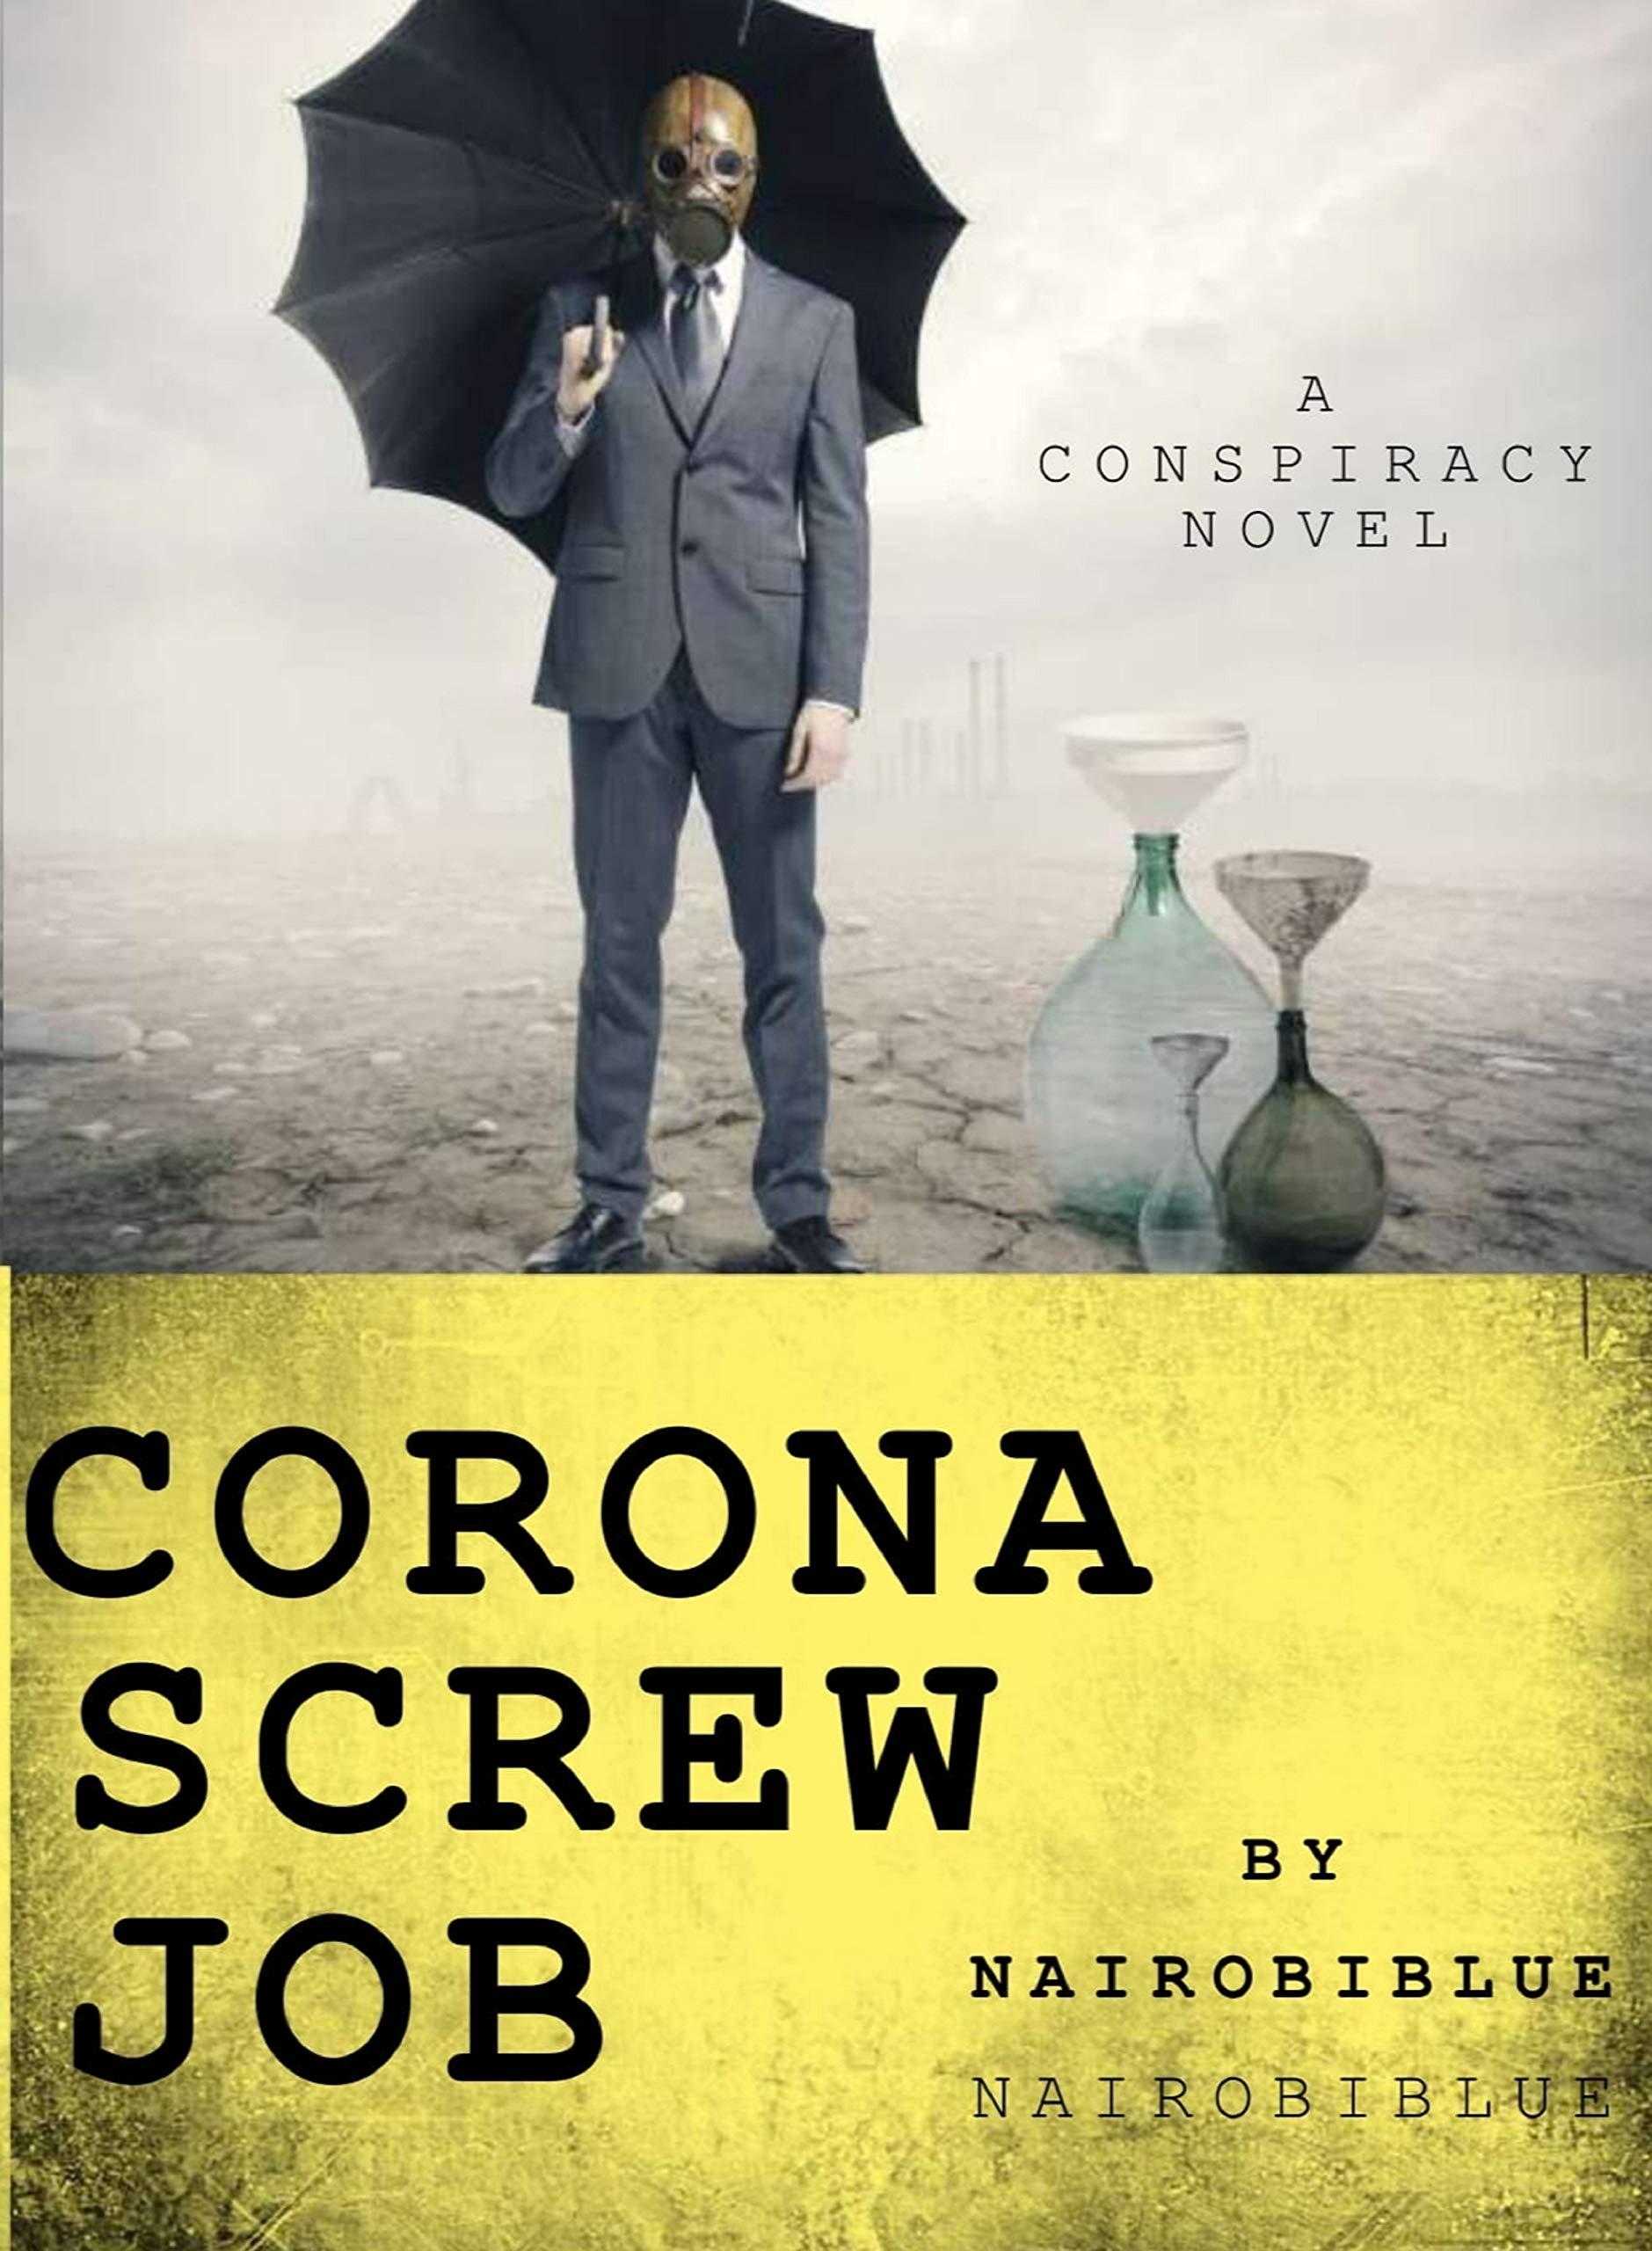 Corona Screwjob: Corona has pretty much f**kd everyone's life, but do you wonder why North Korea unleashed a virus on the world?